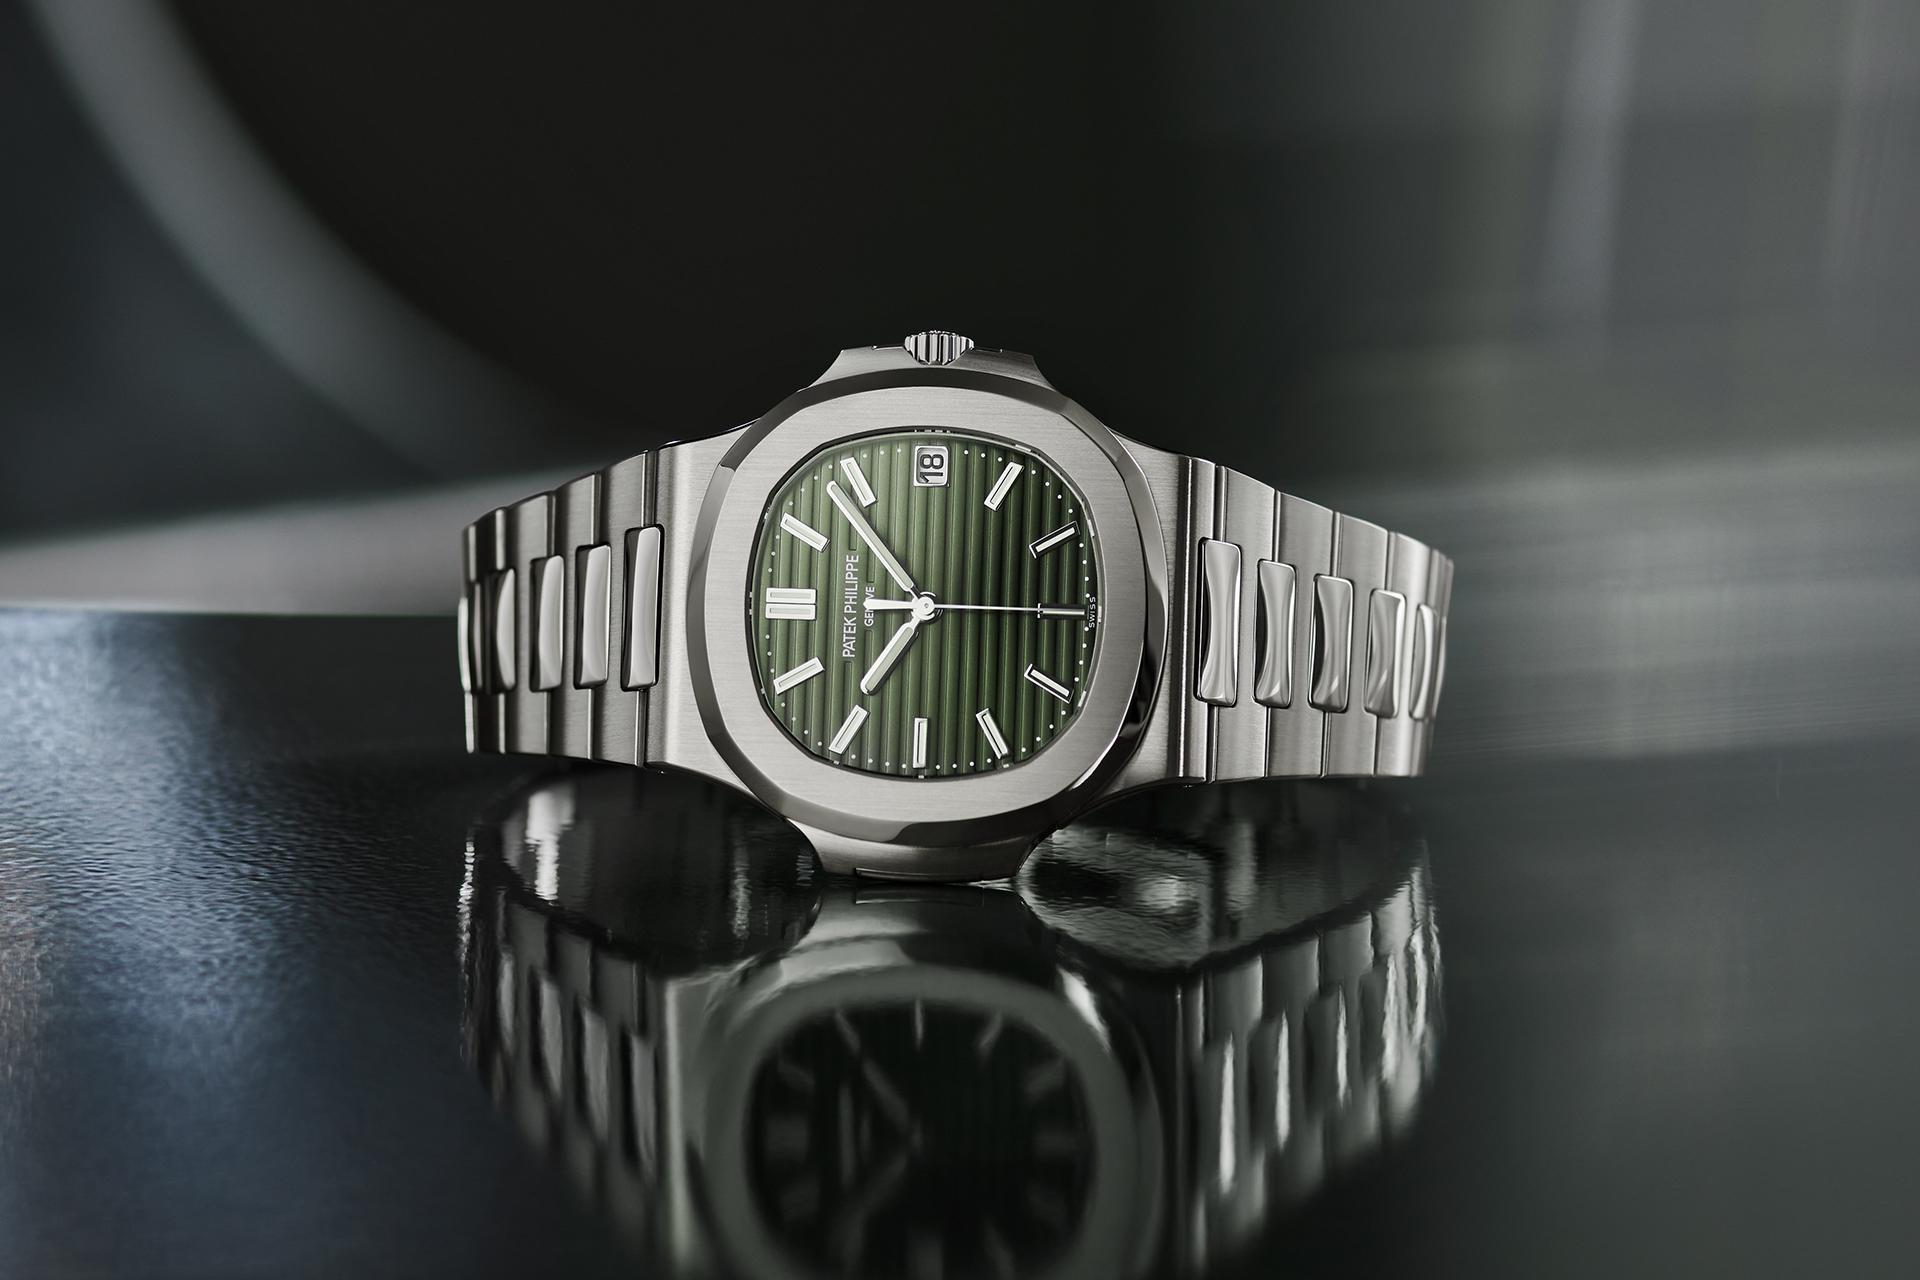 Patek Philippe Nautilus 5711/1A-014 olive green dial